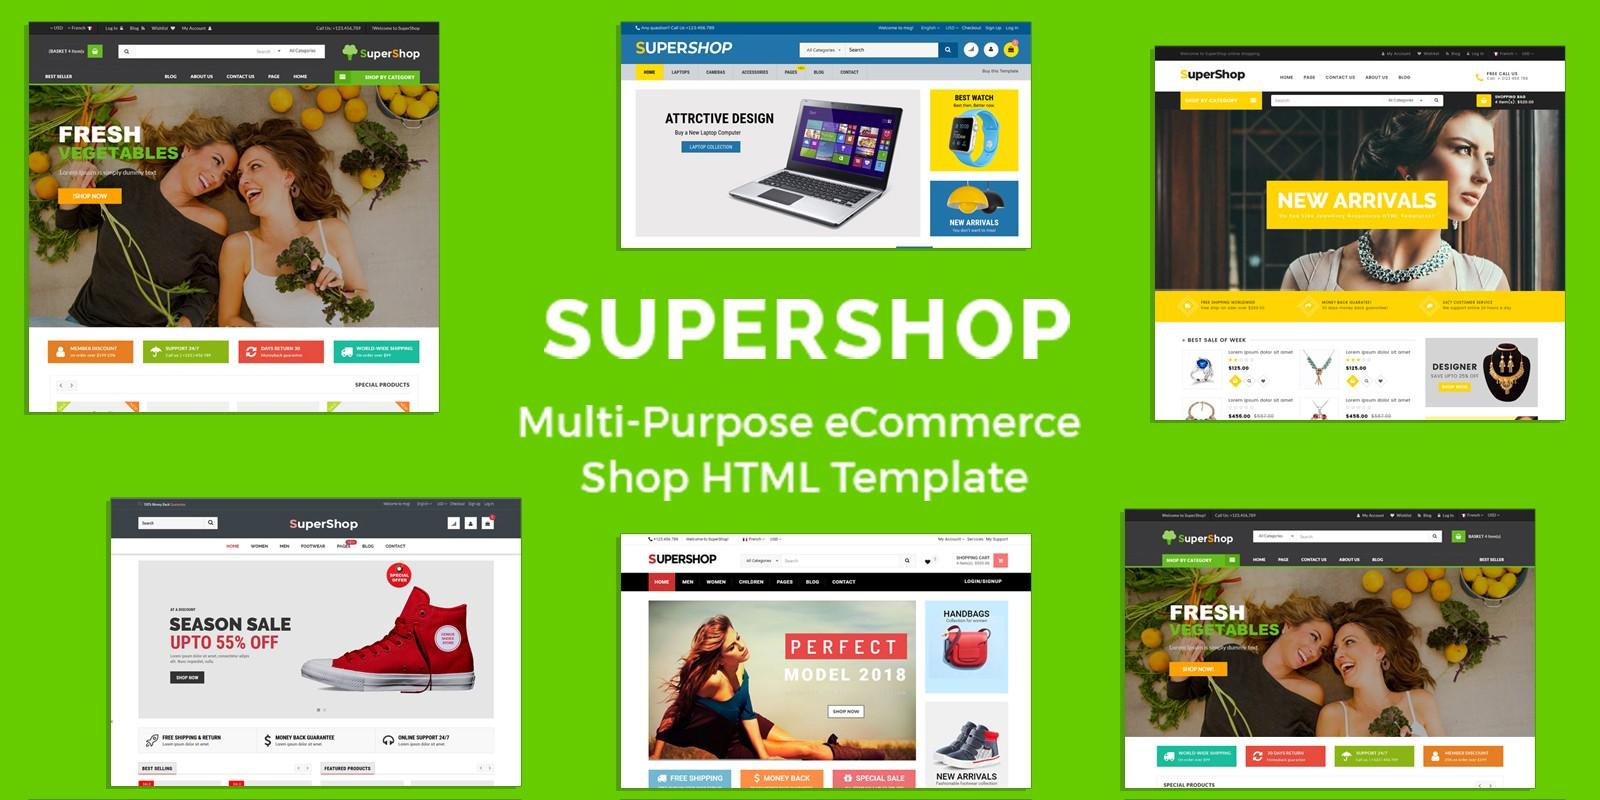 SuperShop - Multipurpose E-Commerce HTML Template